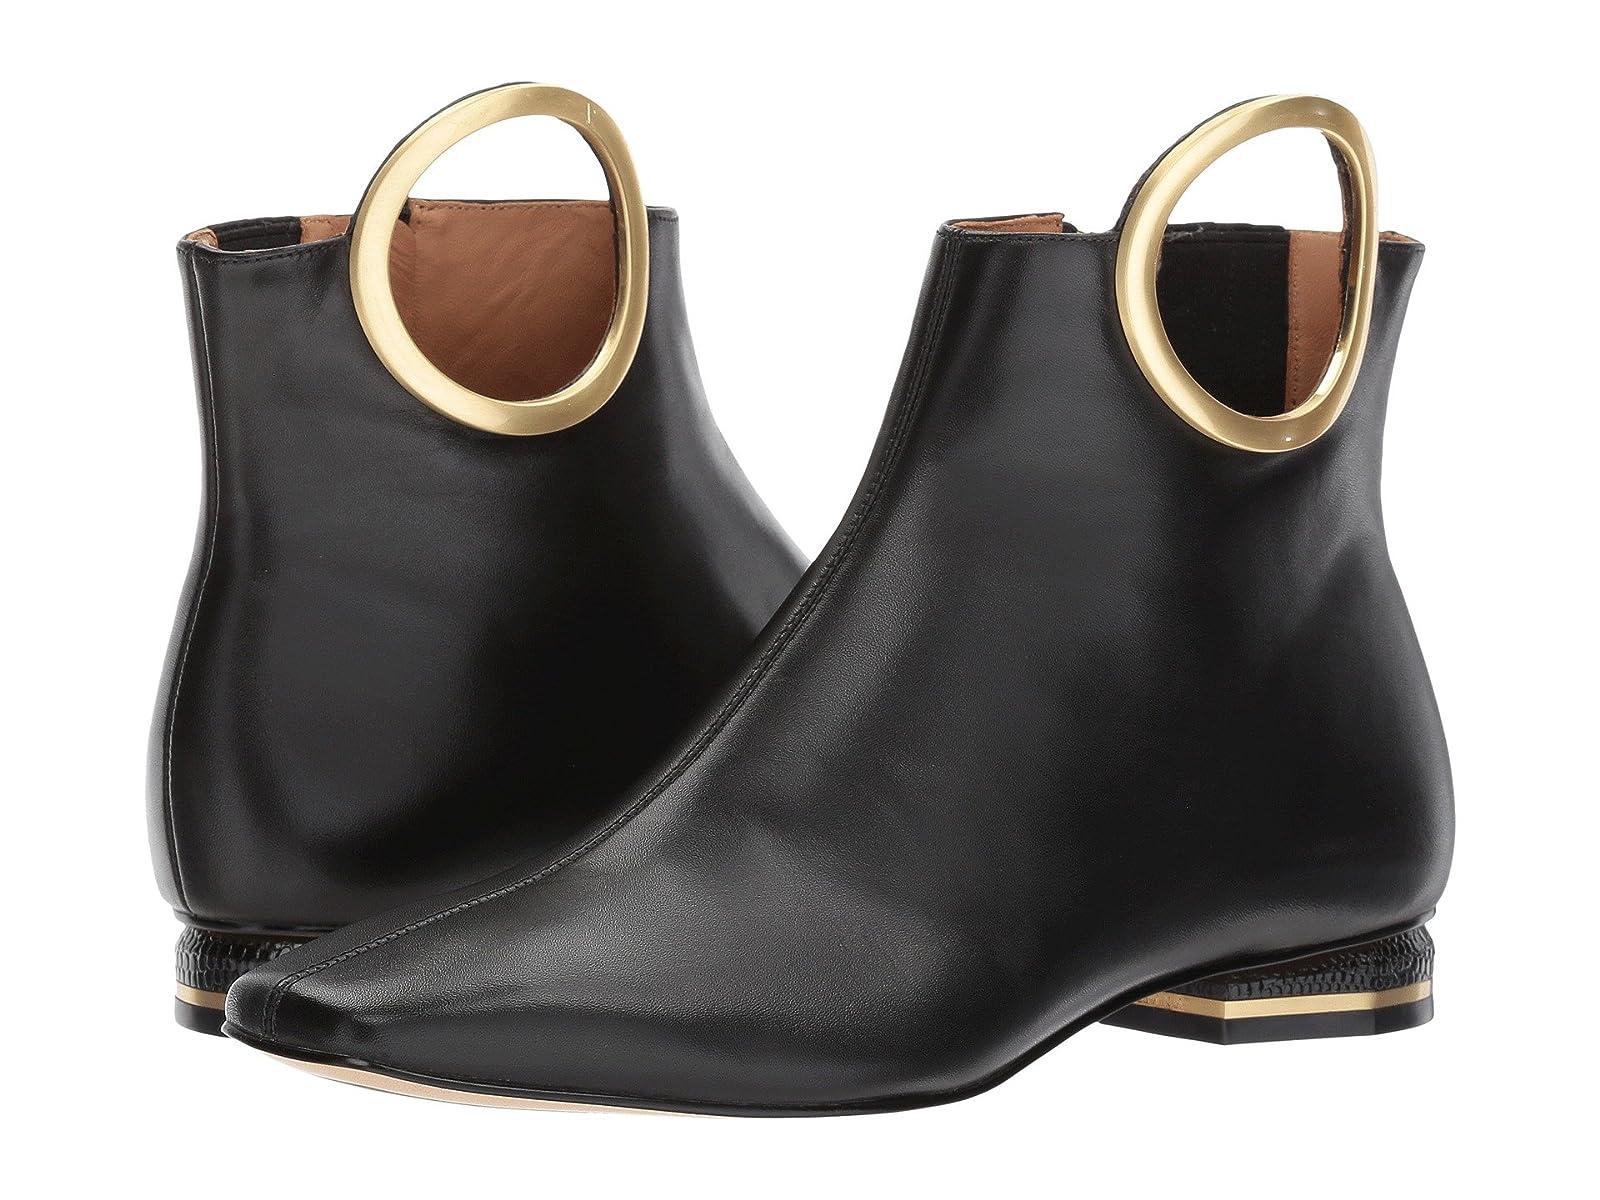 Calvin Klein BlondieCheap and distinctive eye-catching shoes